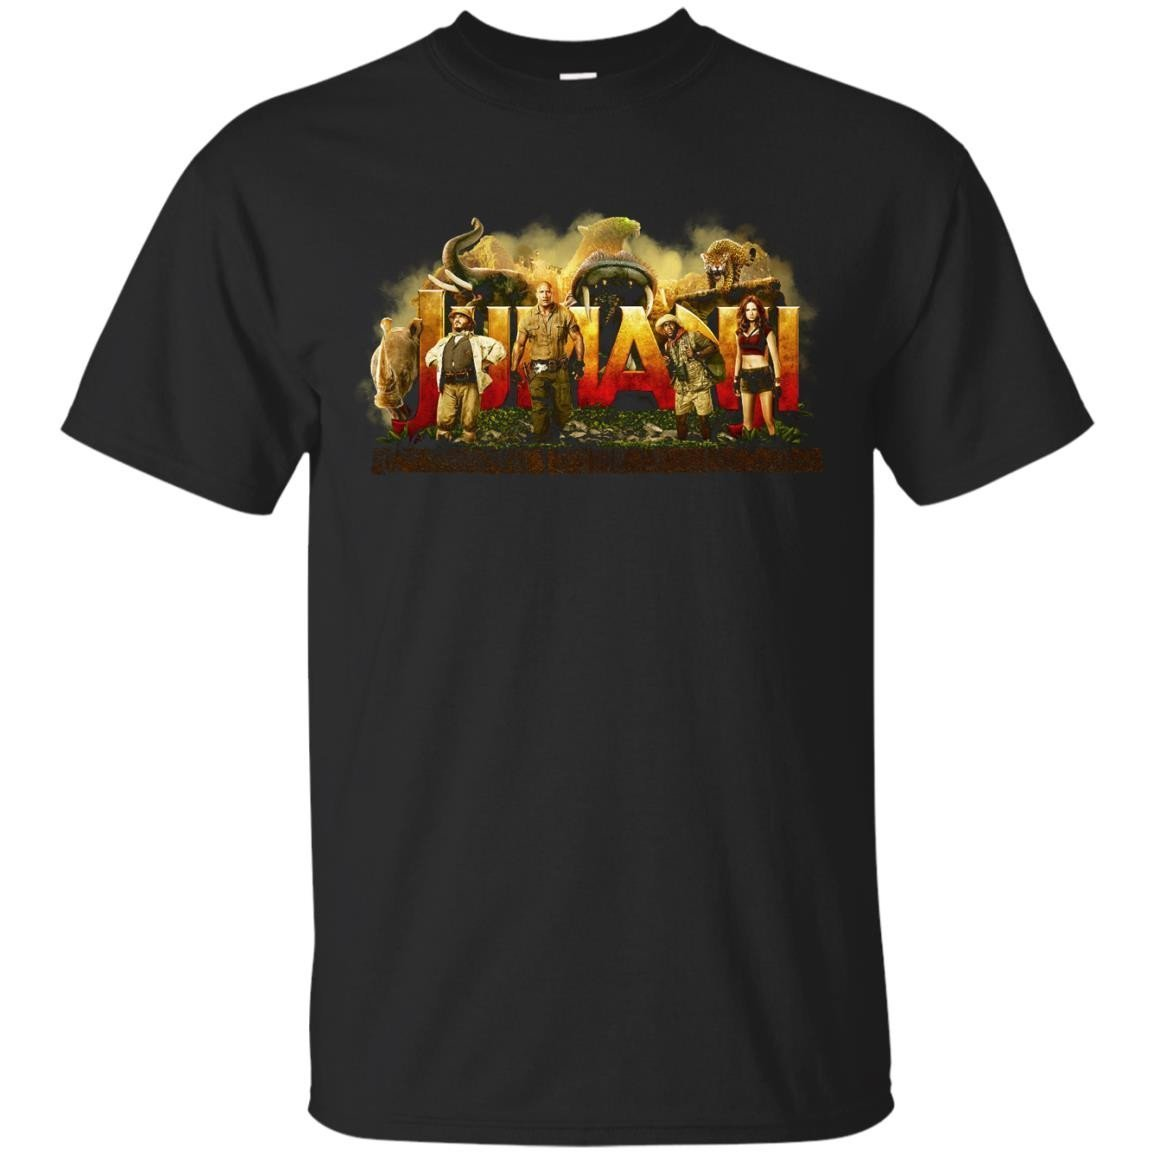 Buy Jumanji Welcome To The Jungle T Shirt